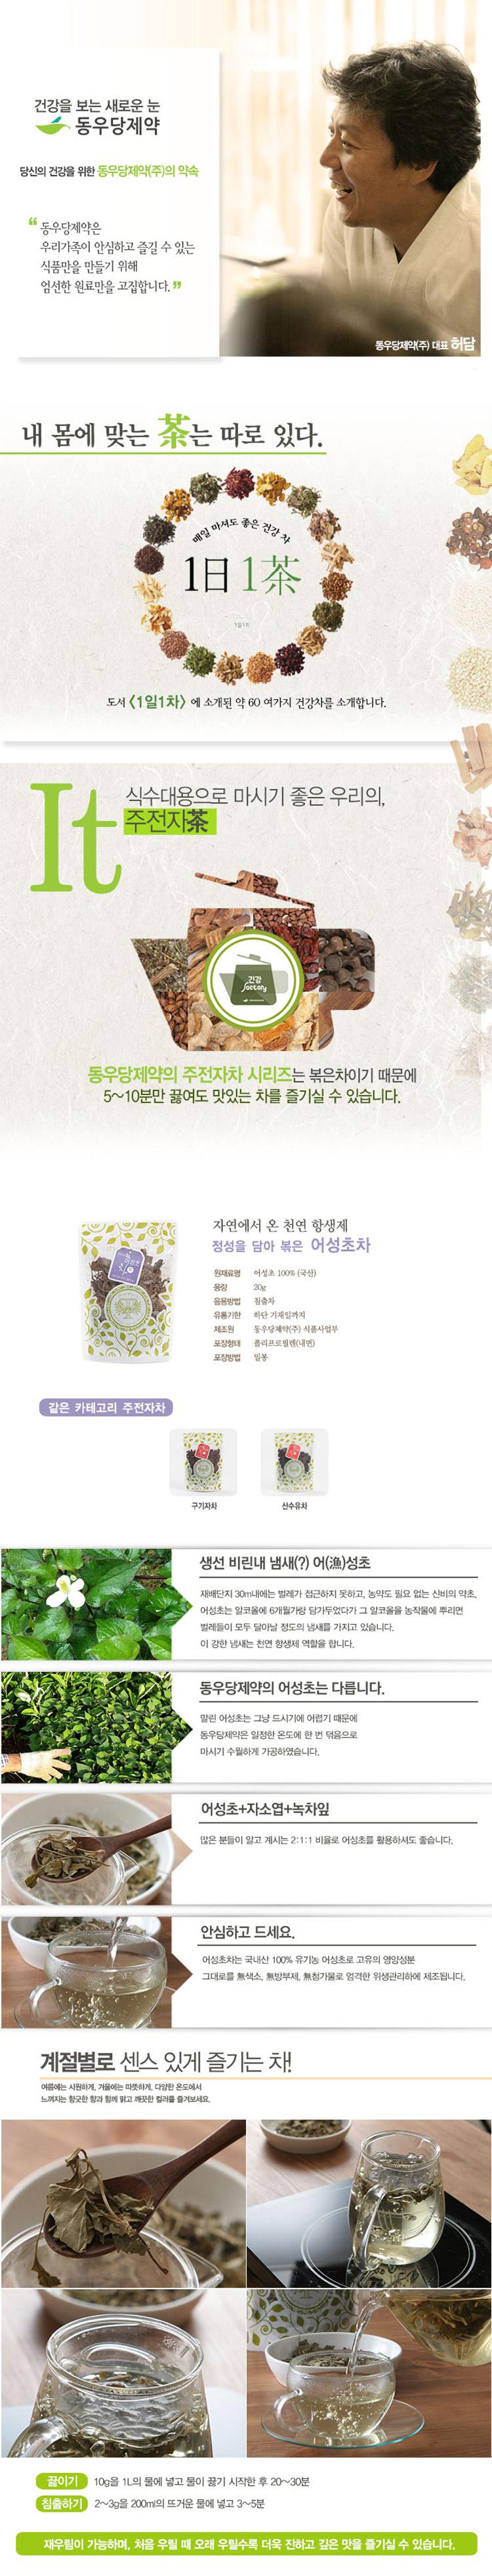 [ DongWuDangMedicine ] [D3][OmniHerb]Roasted Eoseongcho Tea 20g